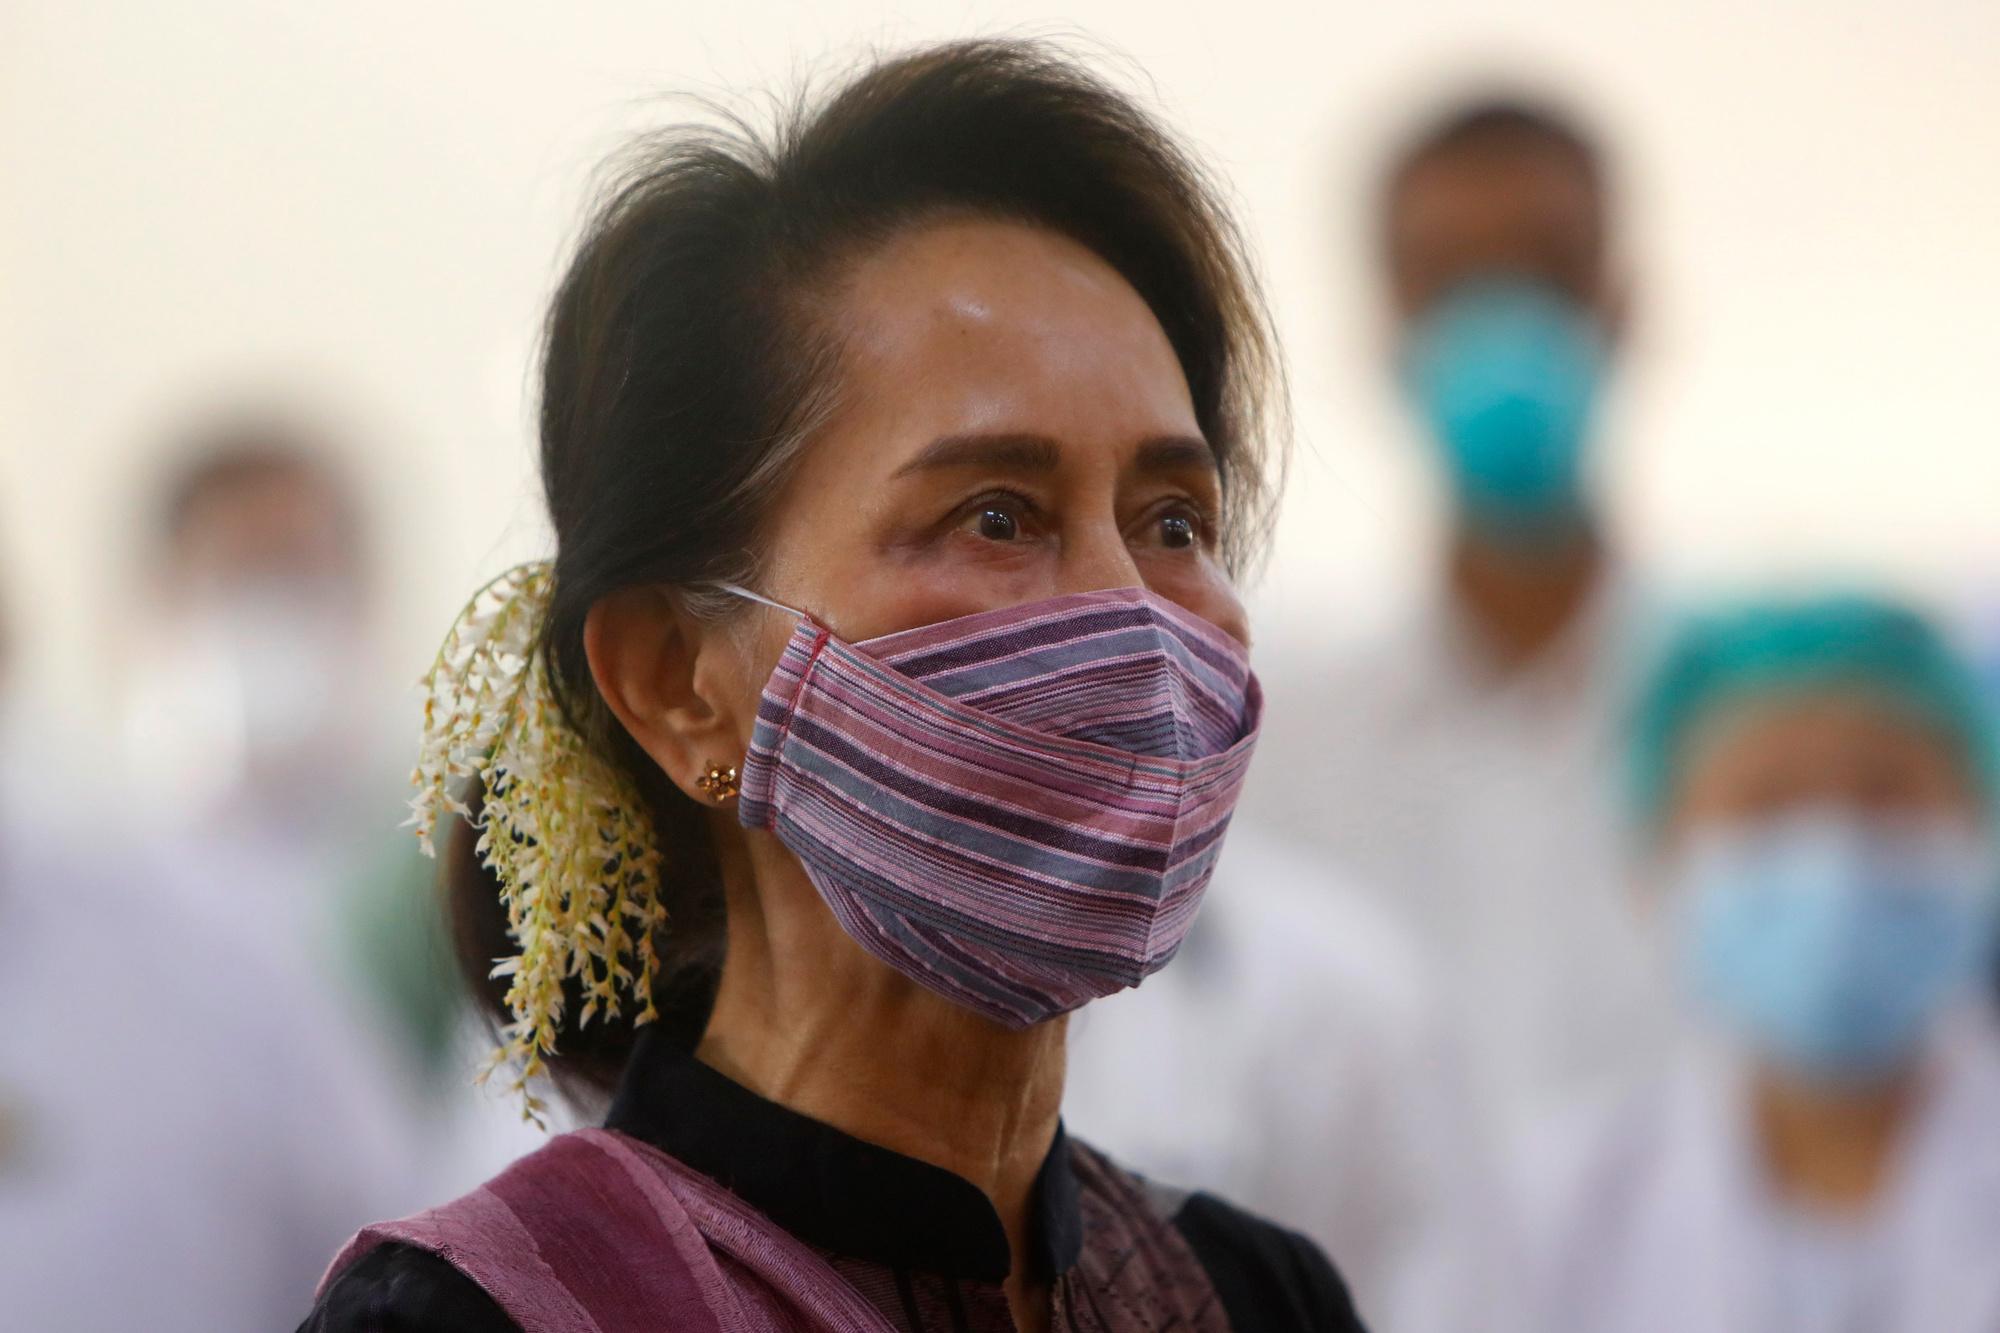 Aung San Suu Kyi, isopix